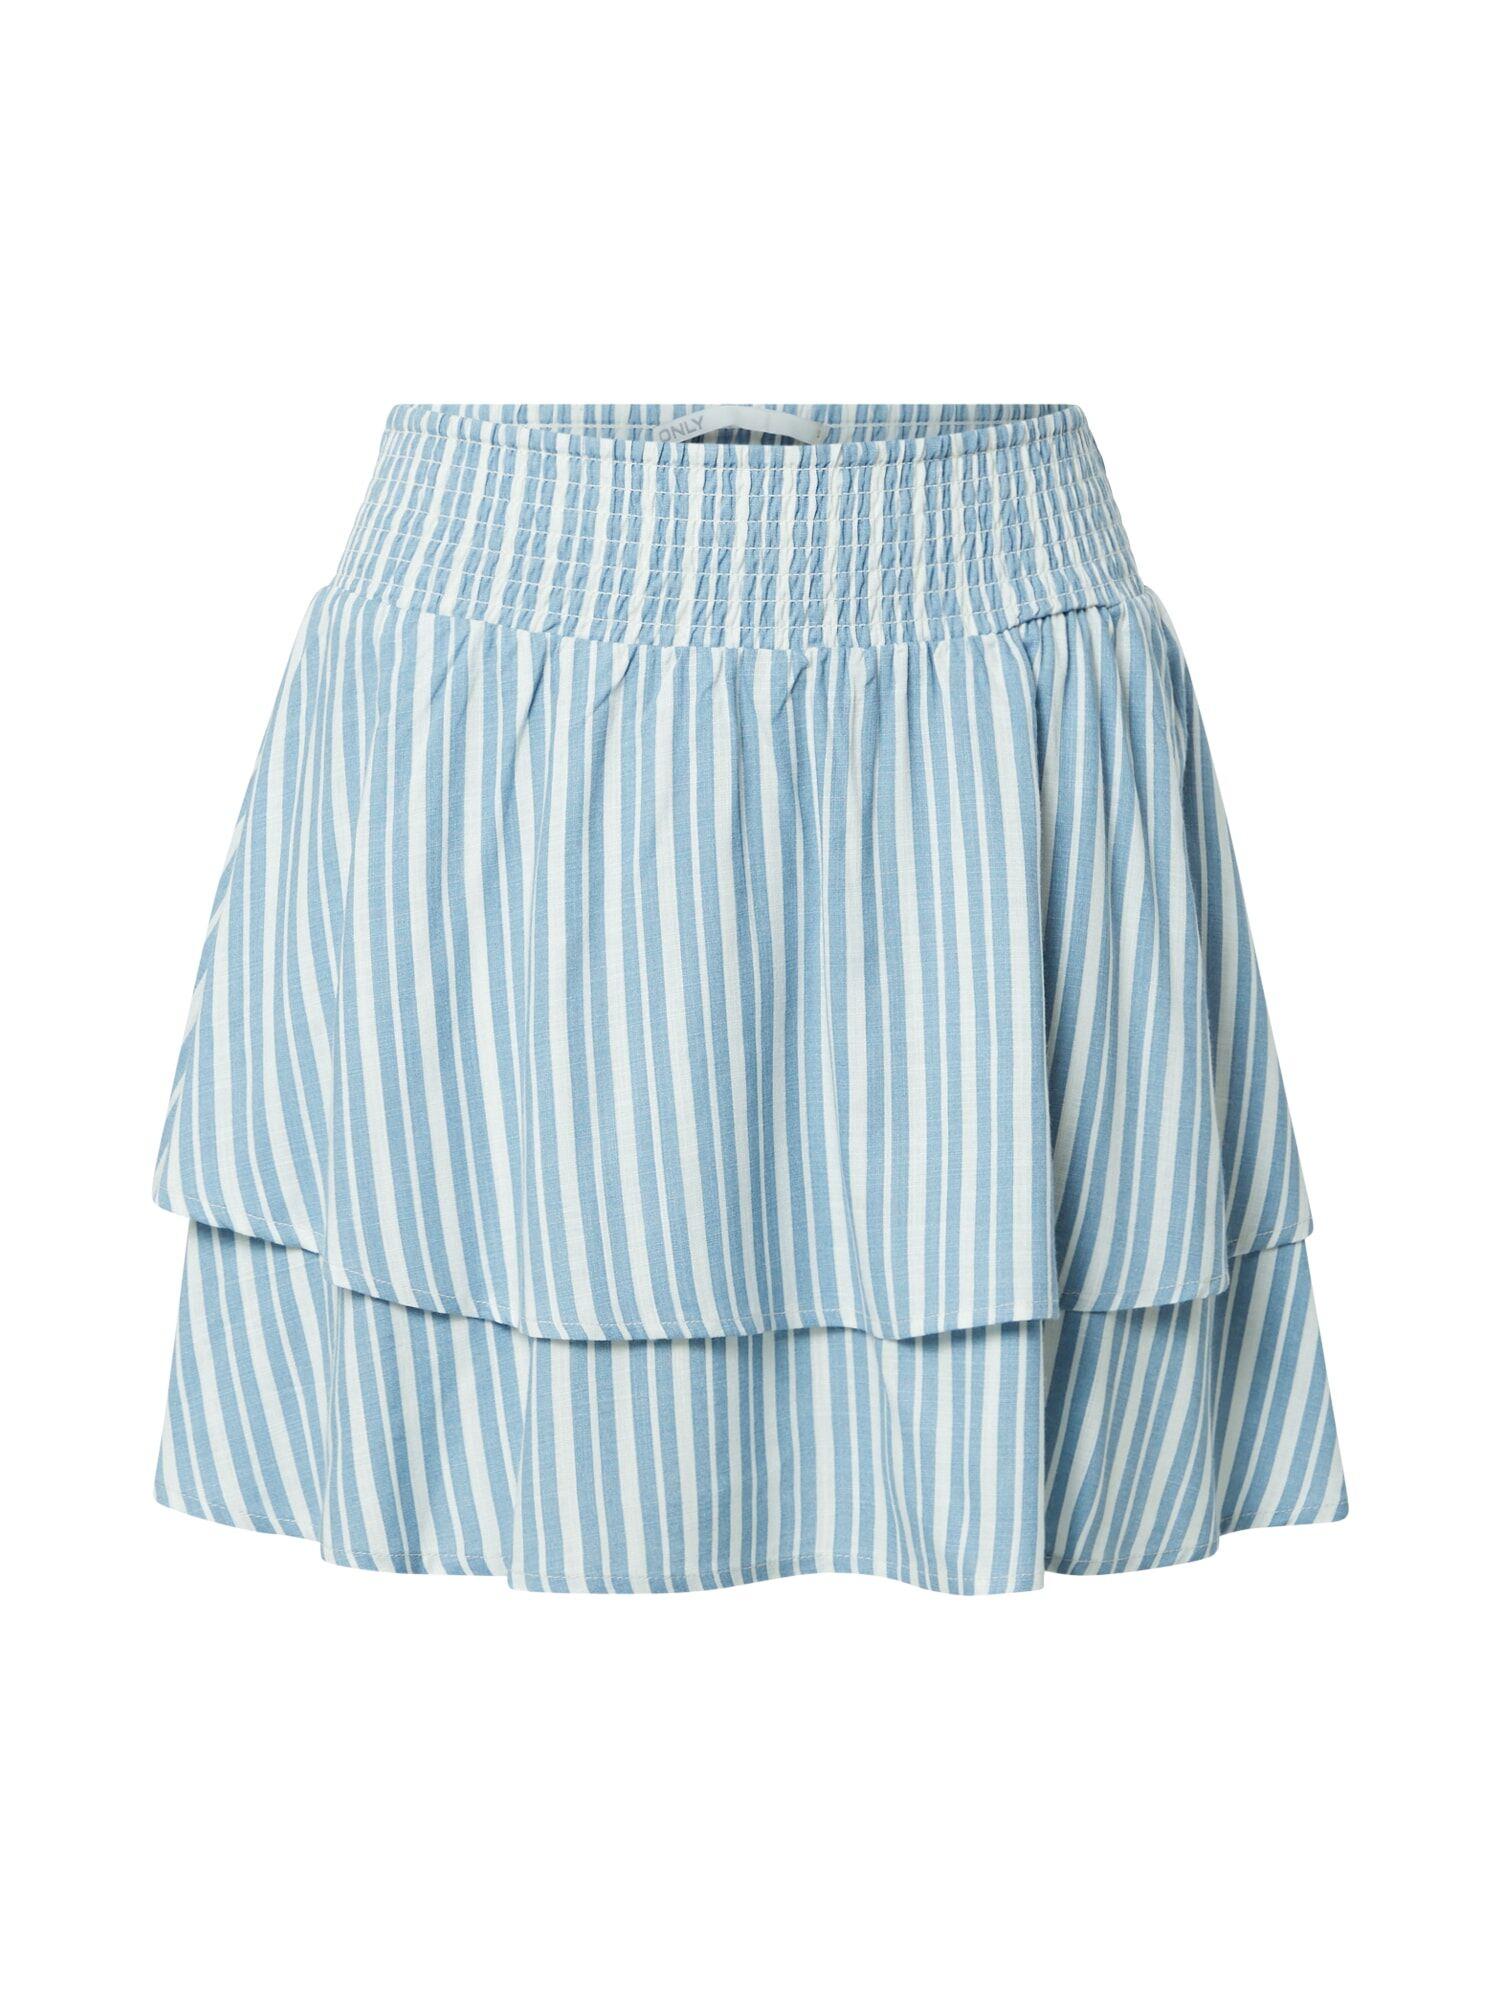 ONLY Jupe 'AURORA'  - Bleu - Taille: XXL - female